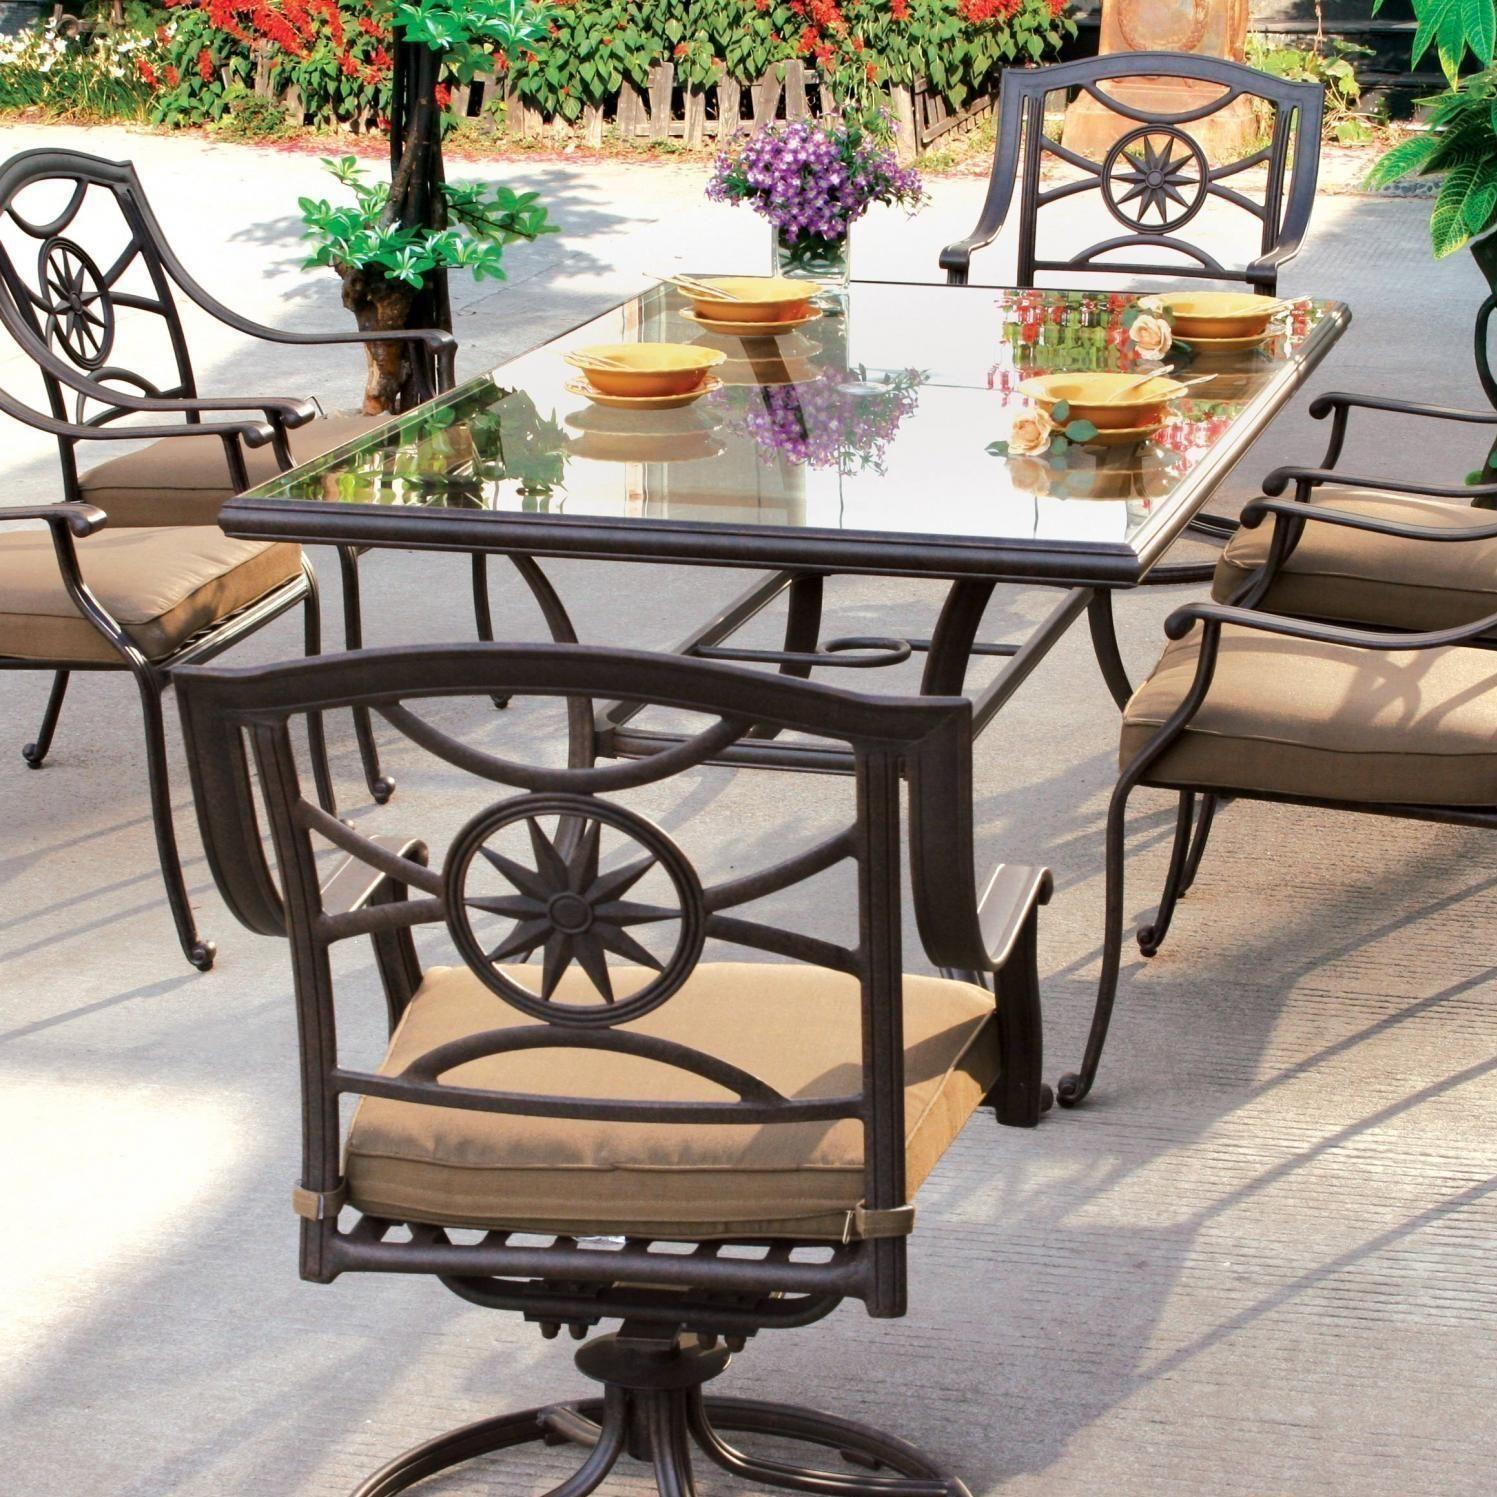 Darlee Ten Star 7 Piece Cast Aluminum Patio Dining Set With Glass